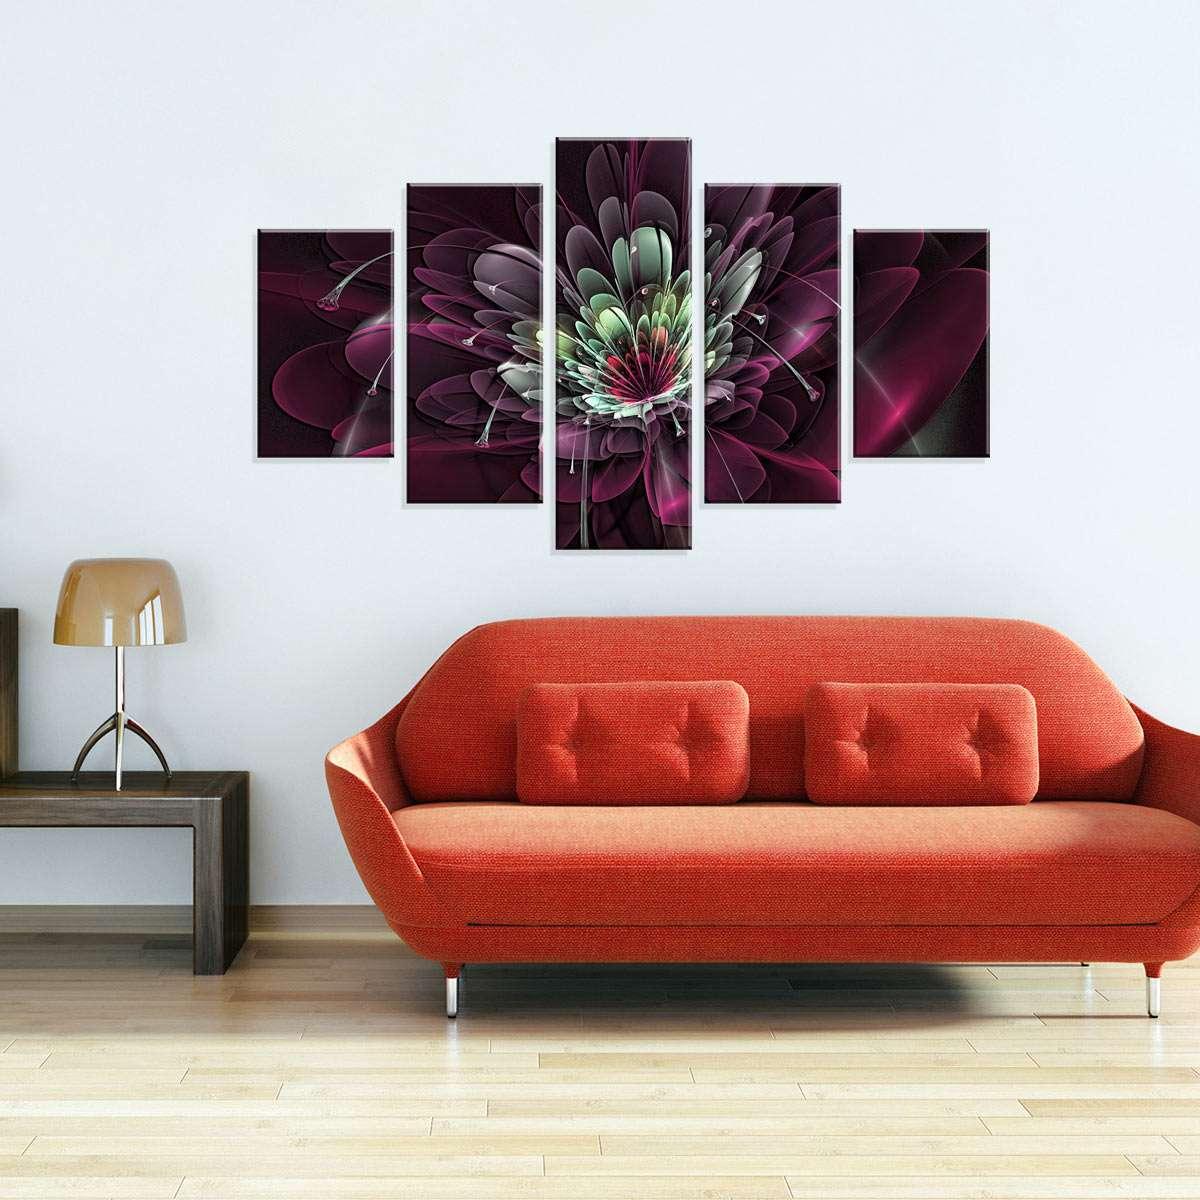 f42aa1a26 Conjunto de 5 Telas Decorativas em Canvas AbstratoFlor 90 x160